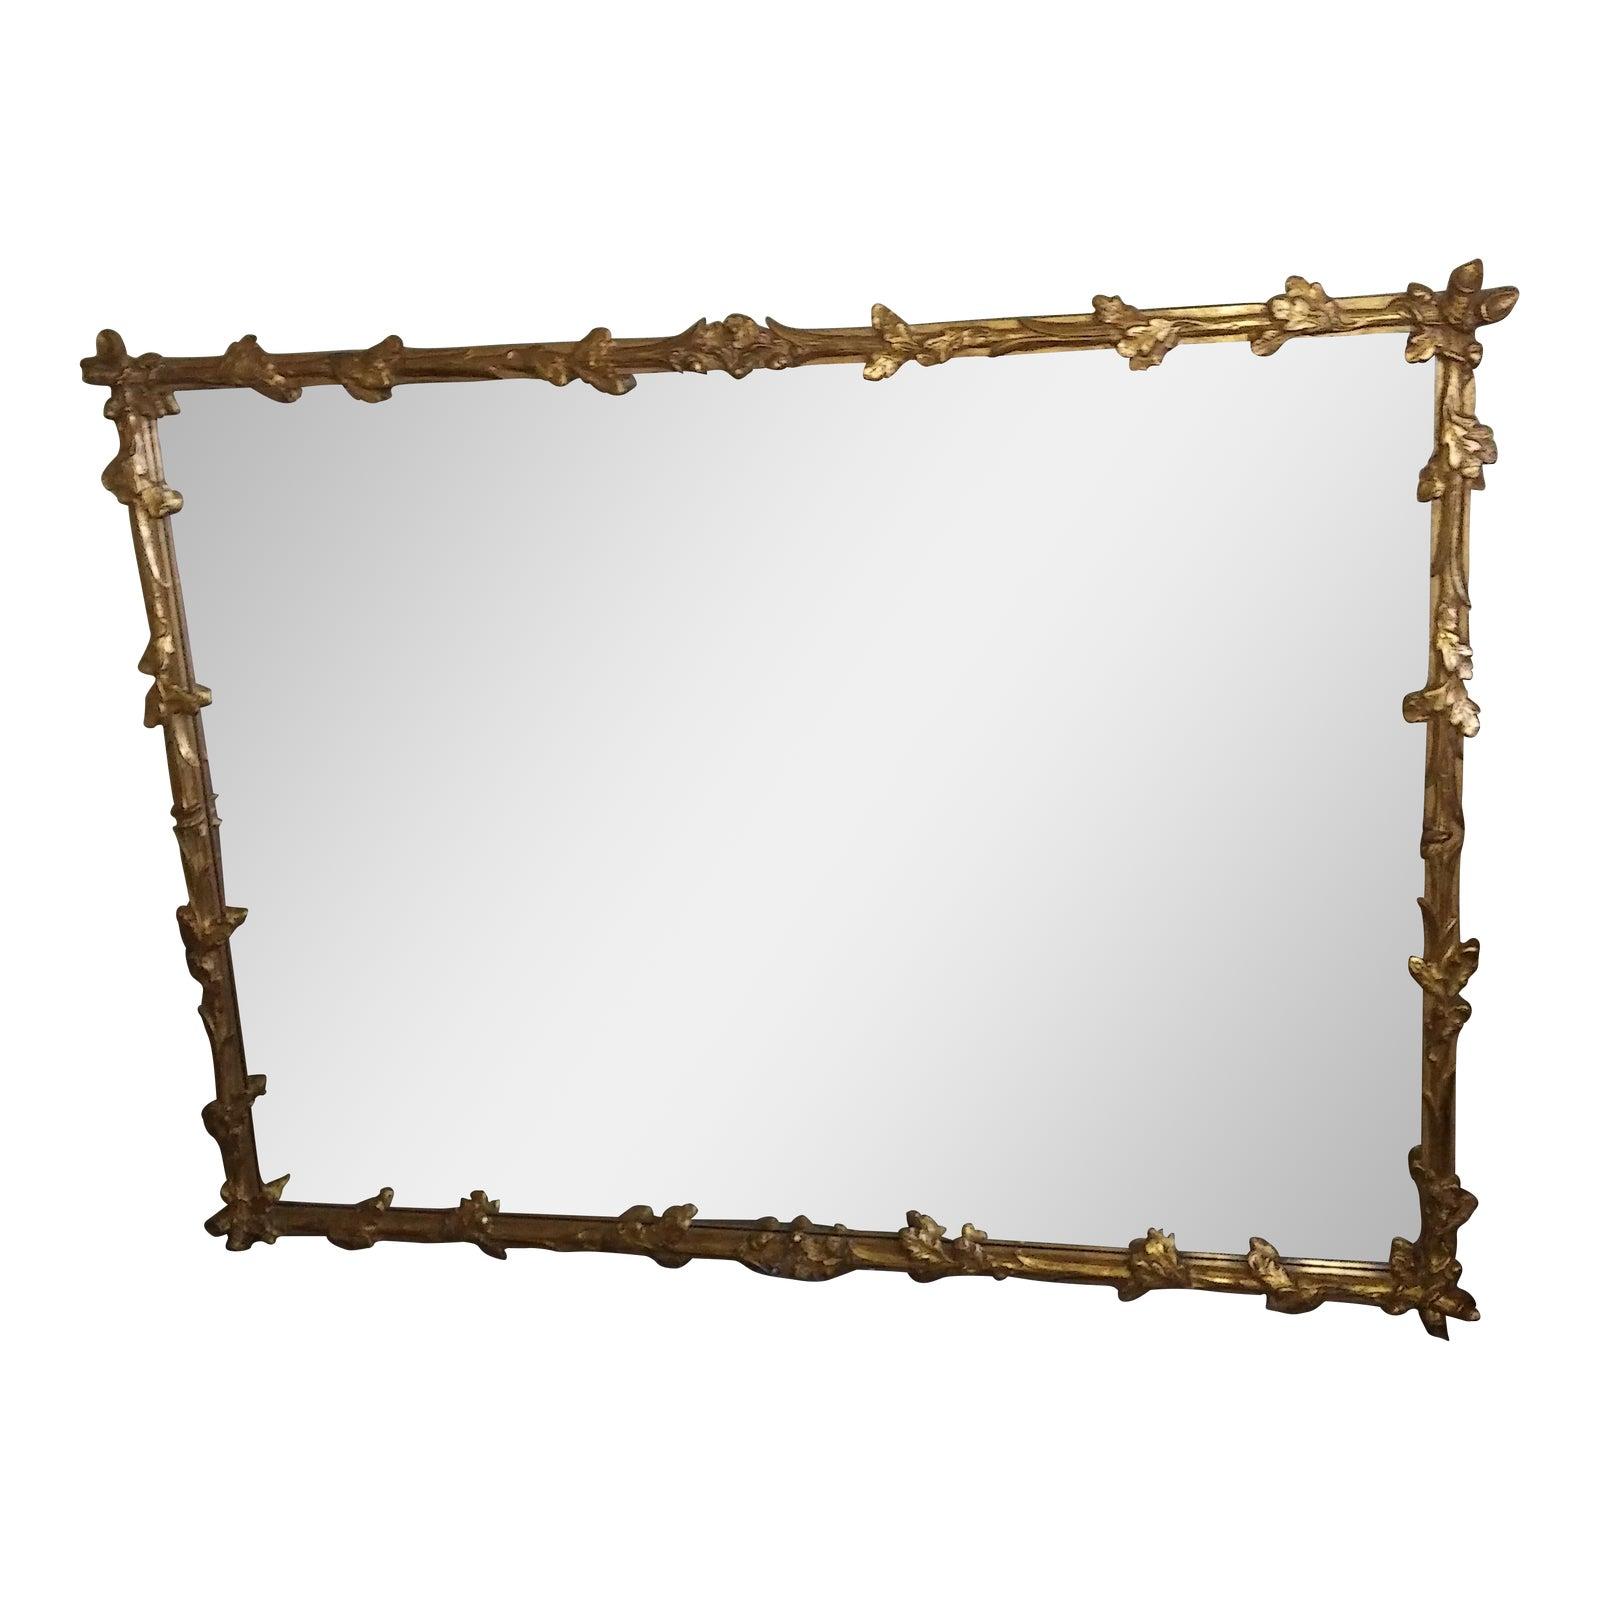 Friedman Brothers Large Gilt Framed Wall Mirror Oak Leaves &